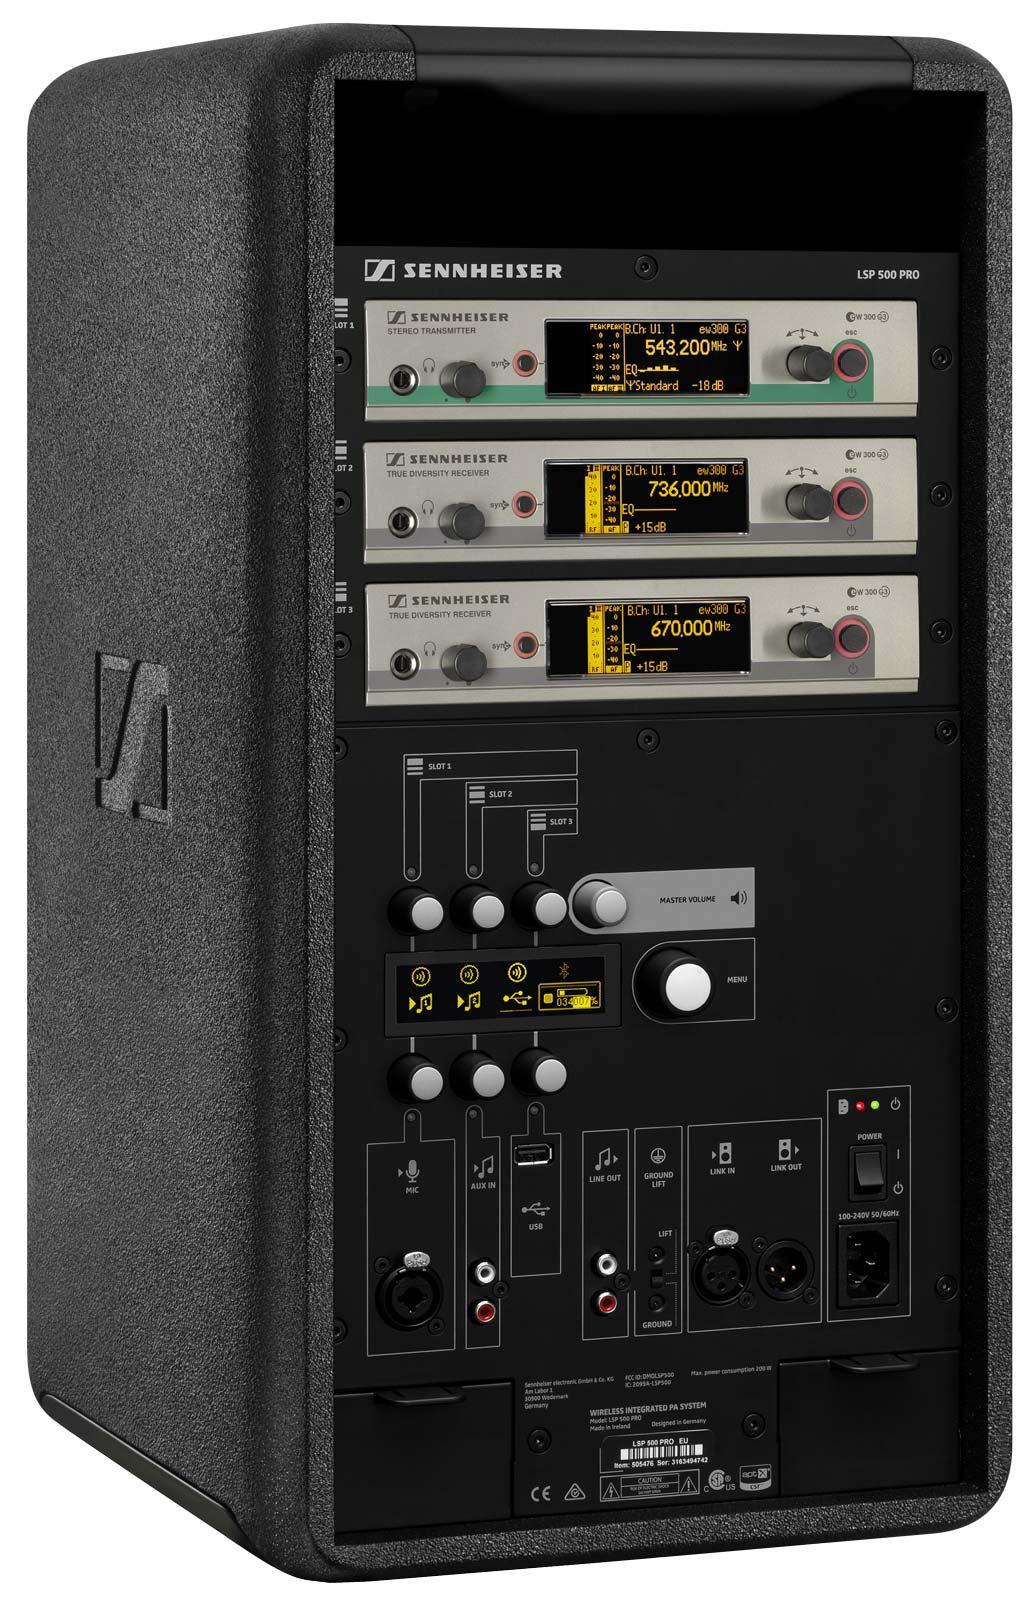 Sennheiser Lsp 500 Pro Self Powered Pa System Fac365 Ltd